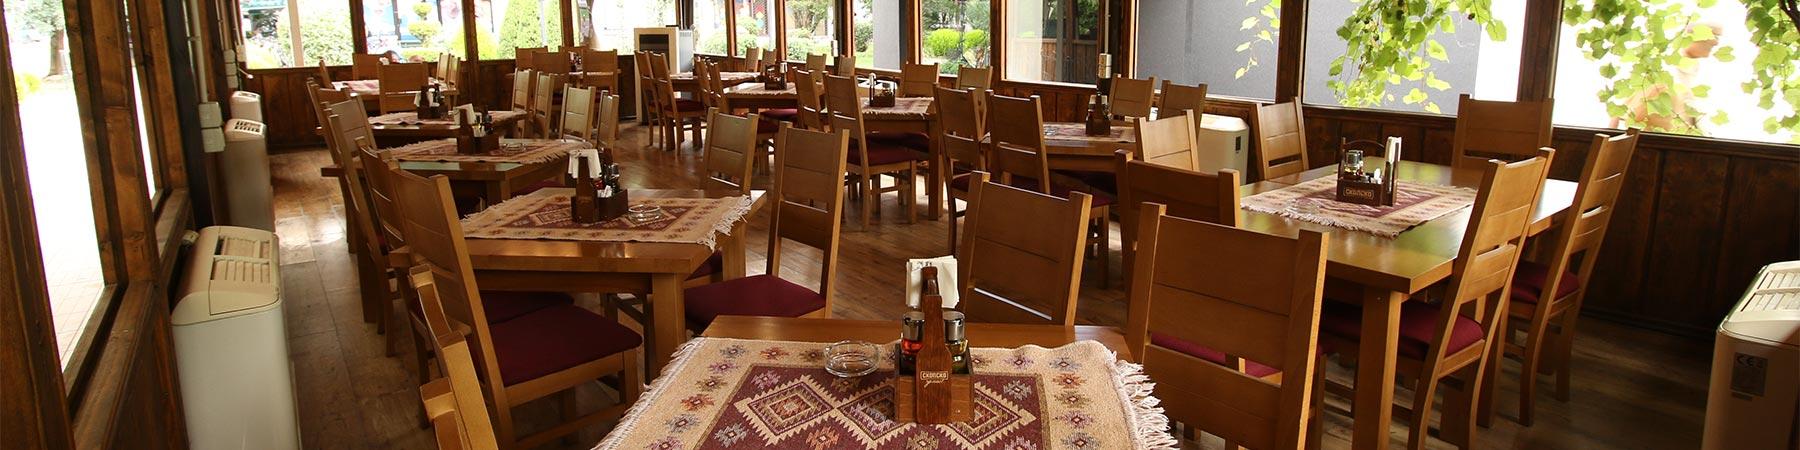 Restaurant Staro Bure